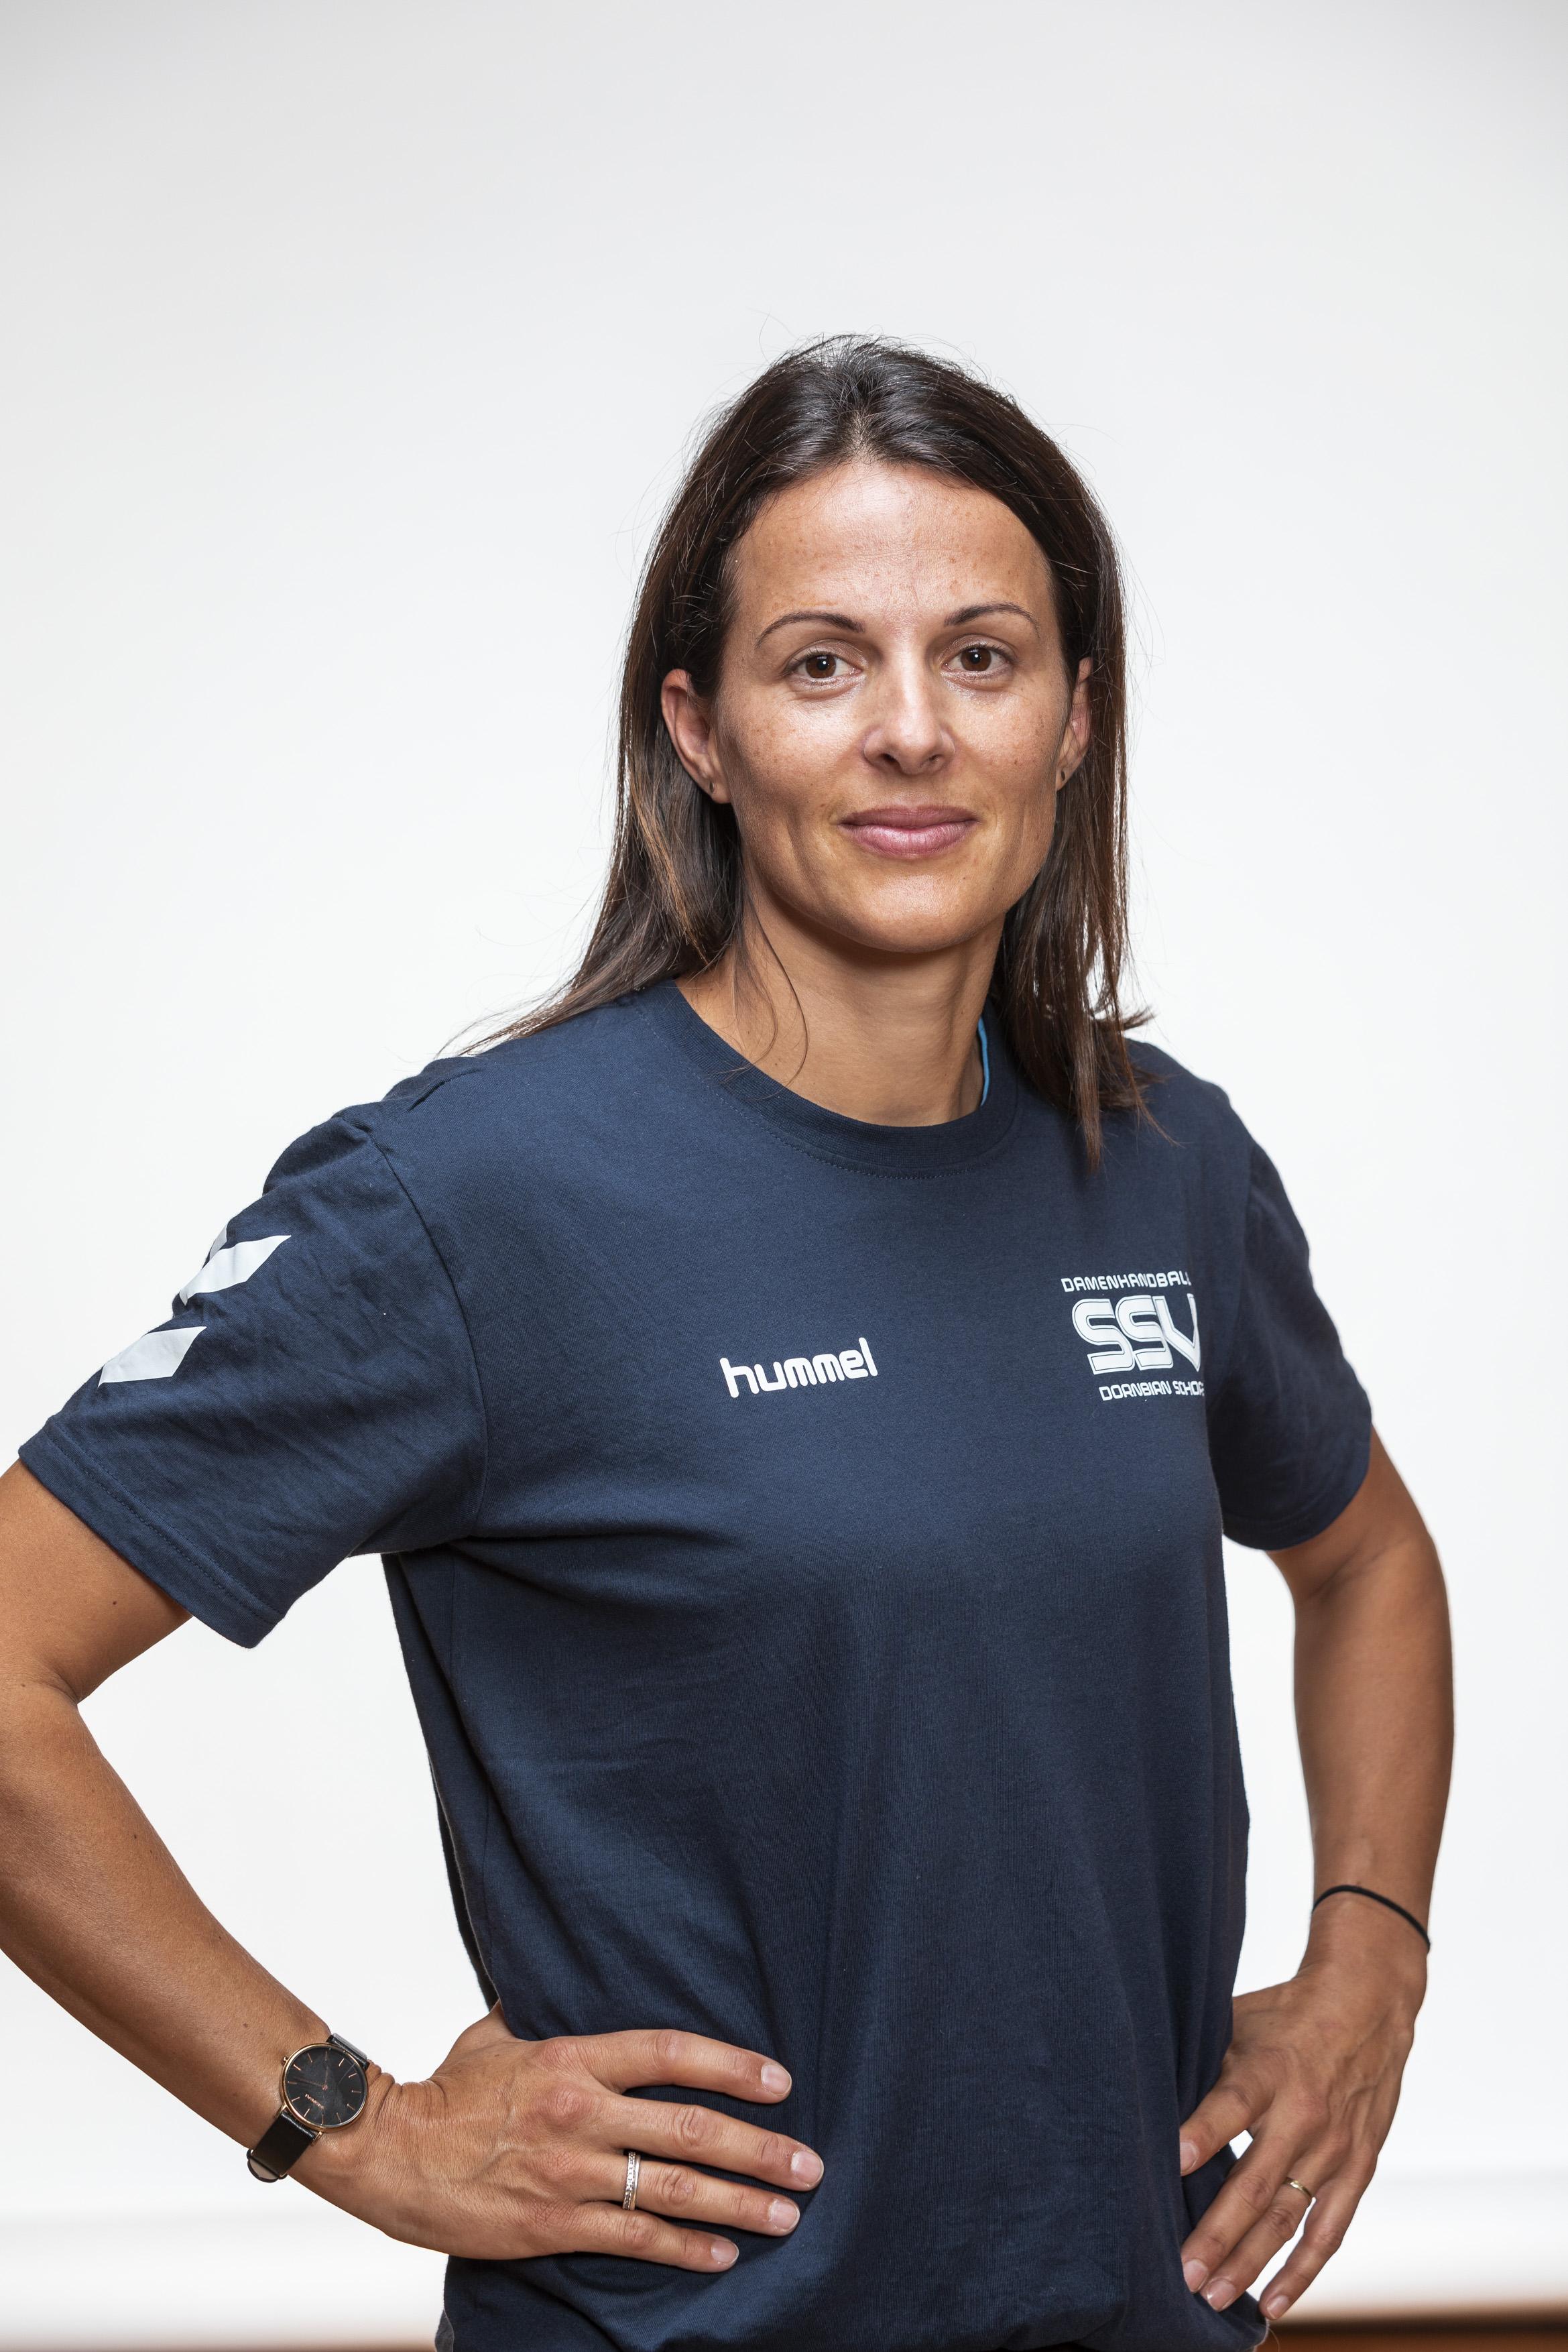 Ariane Kapp